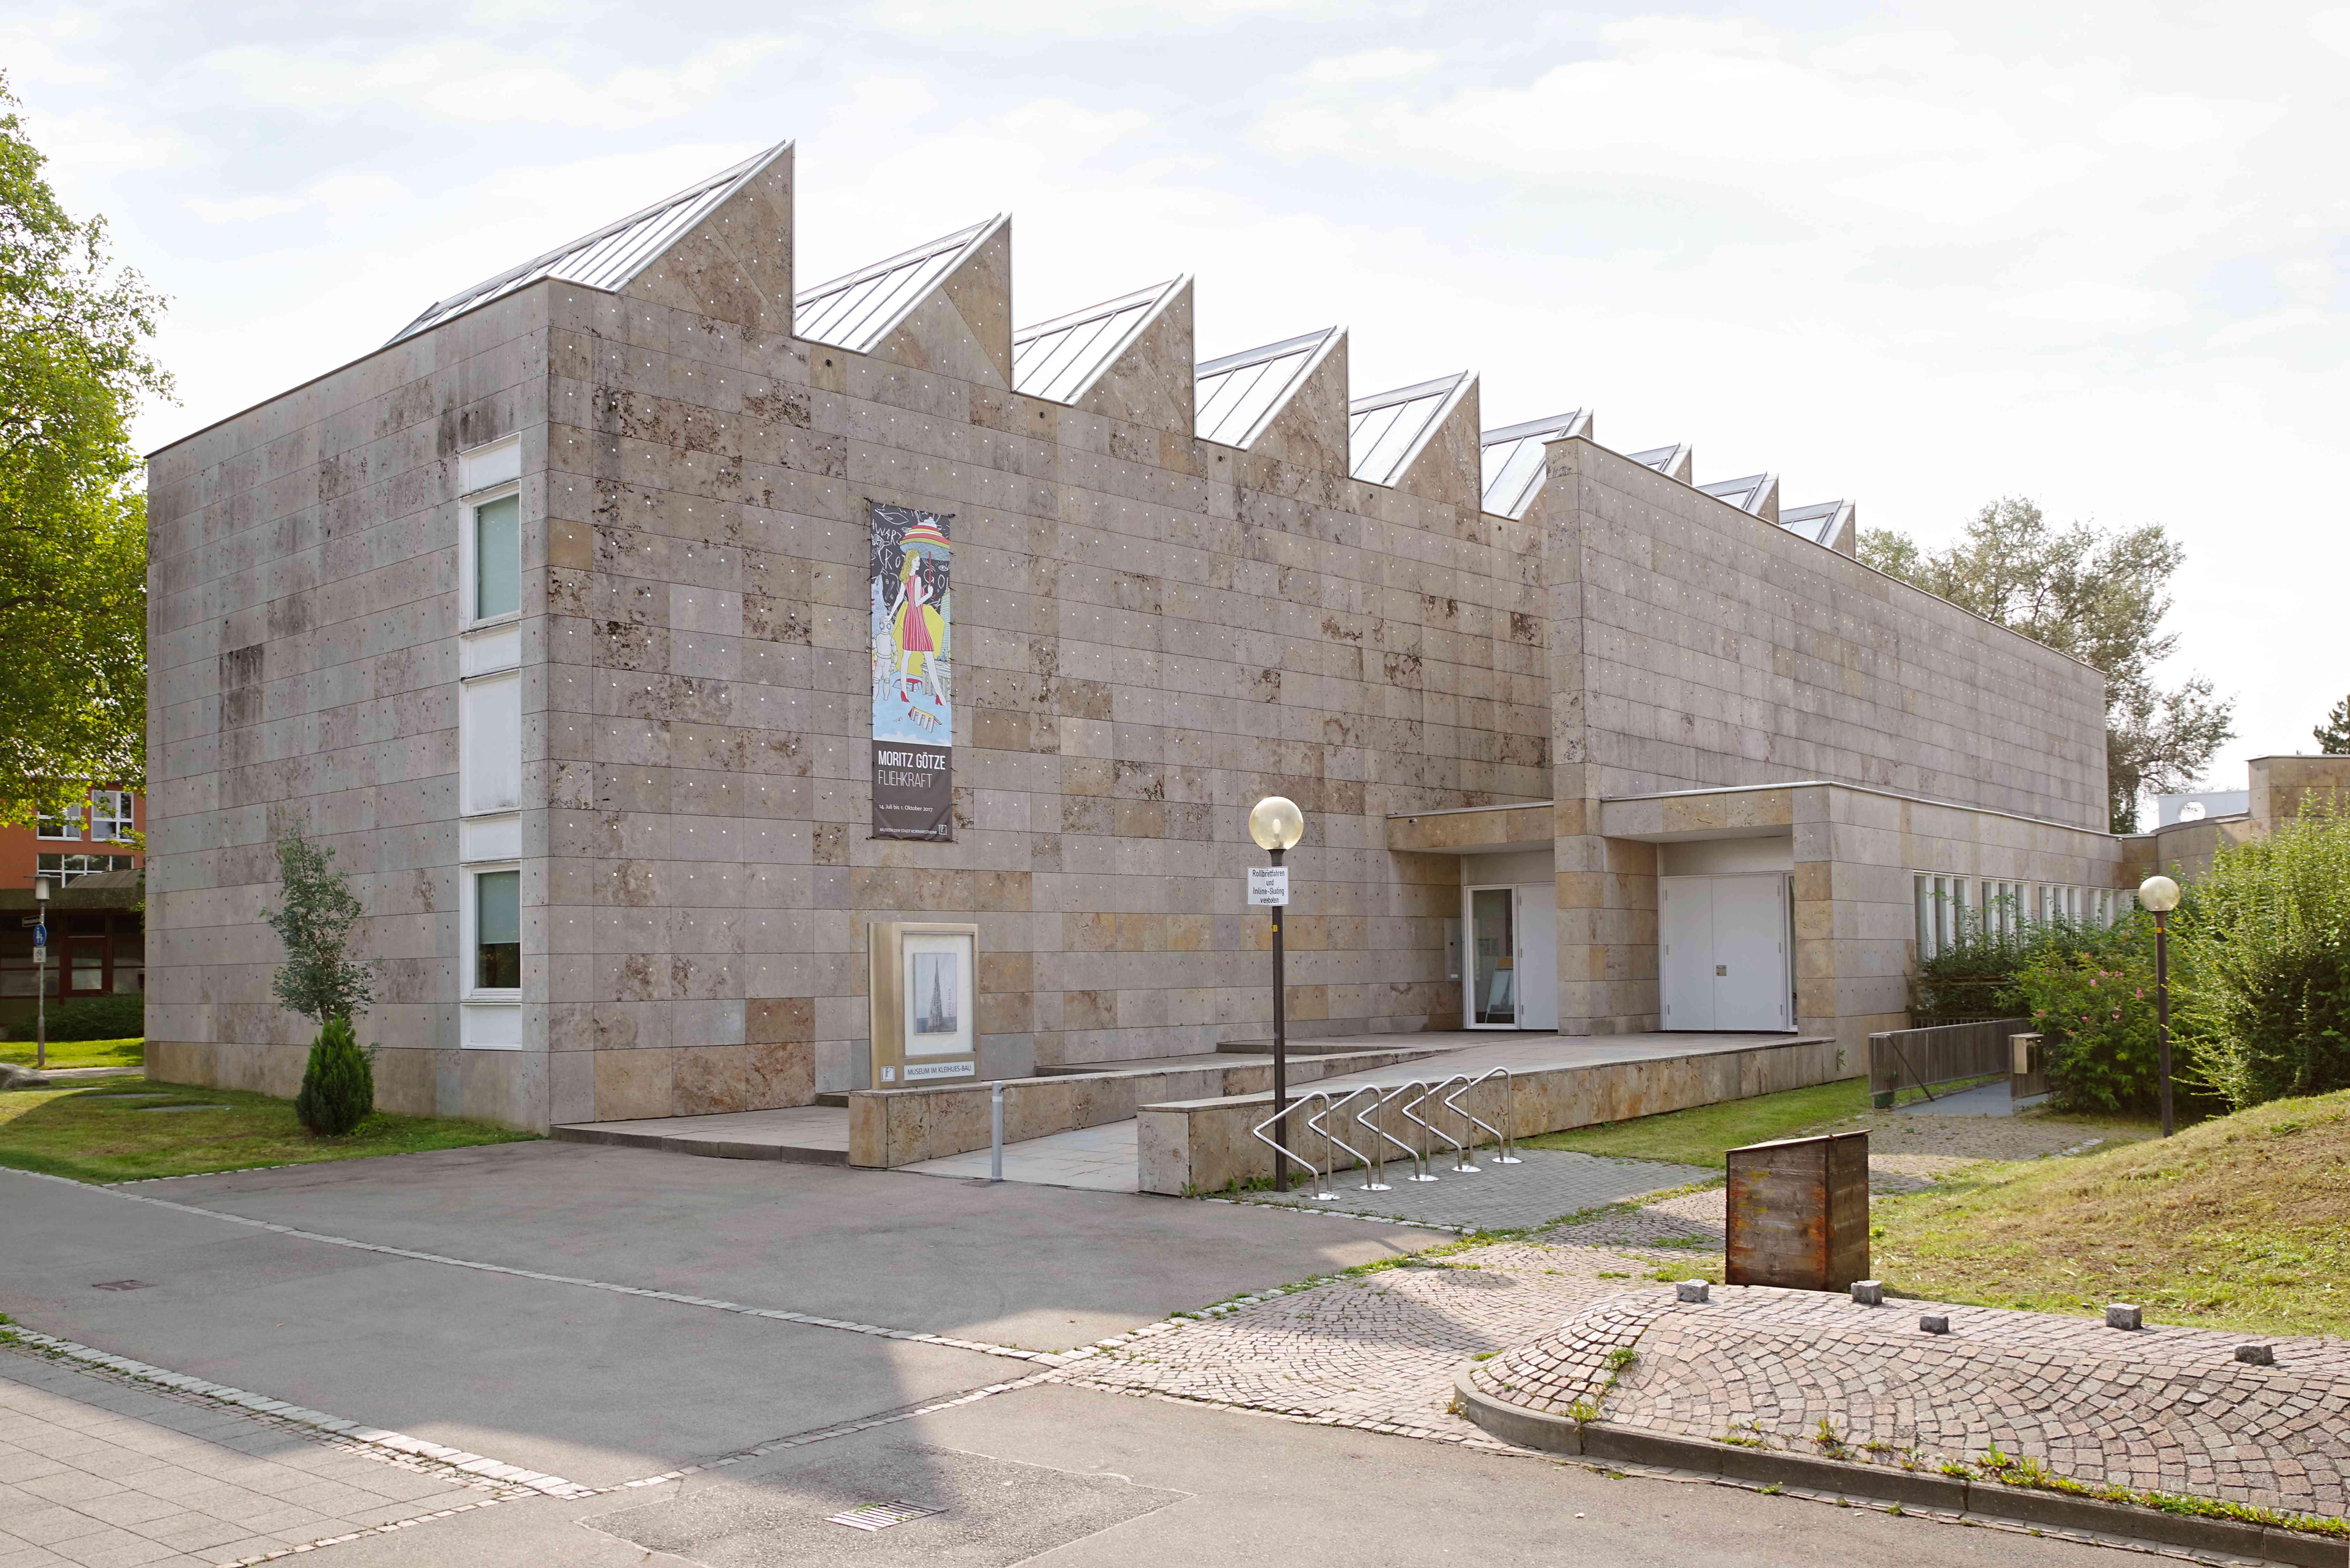 Museum Im Kleihues Bau Wikipedia